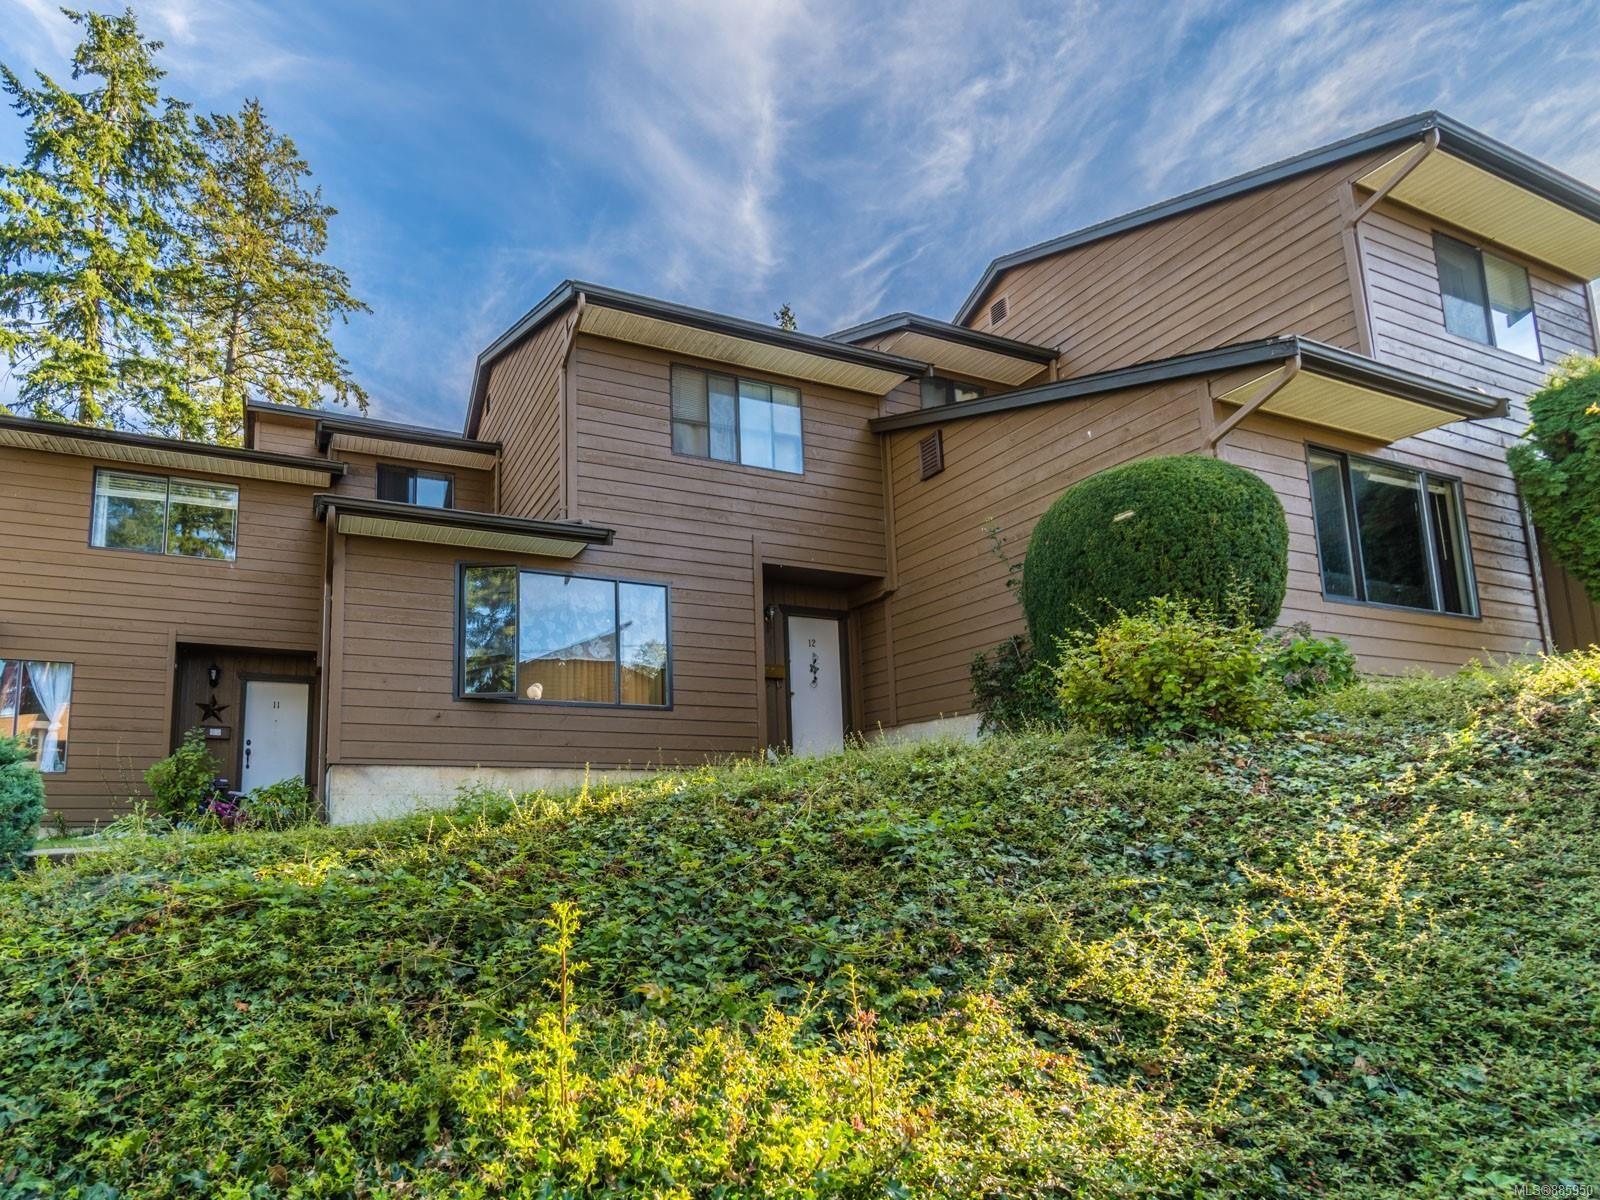 Main Photo: 12 855 Howard Ave in : Na South Nanaimo Row/Townhouse for sale (Nanaimo)  : MLS®# 885950